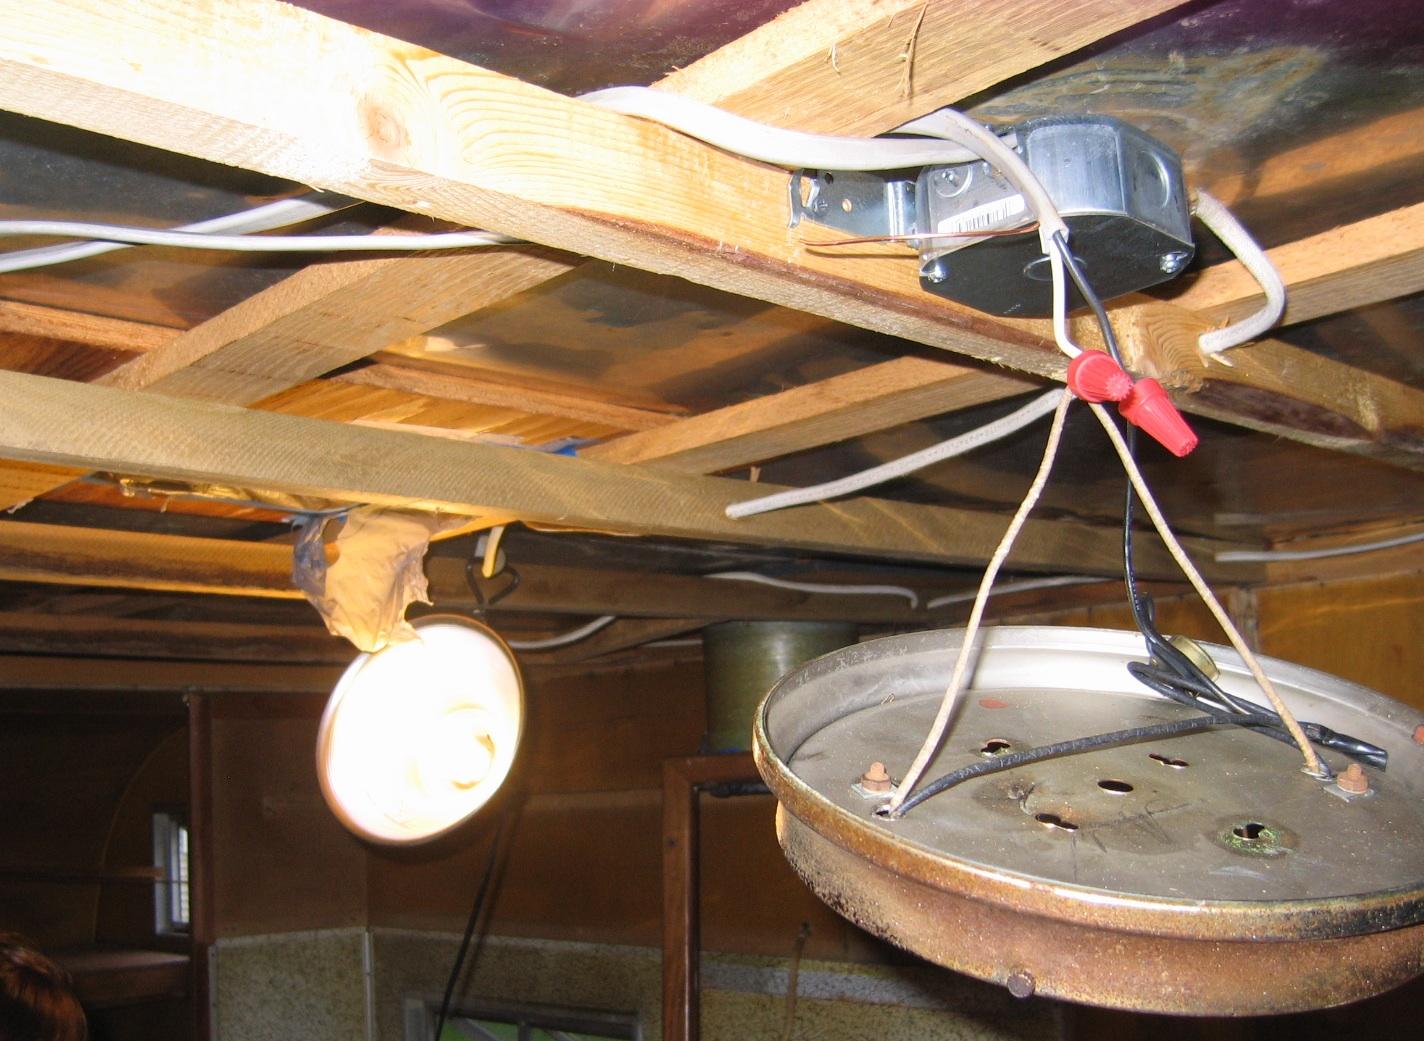 Interior electrical work